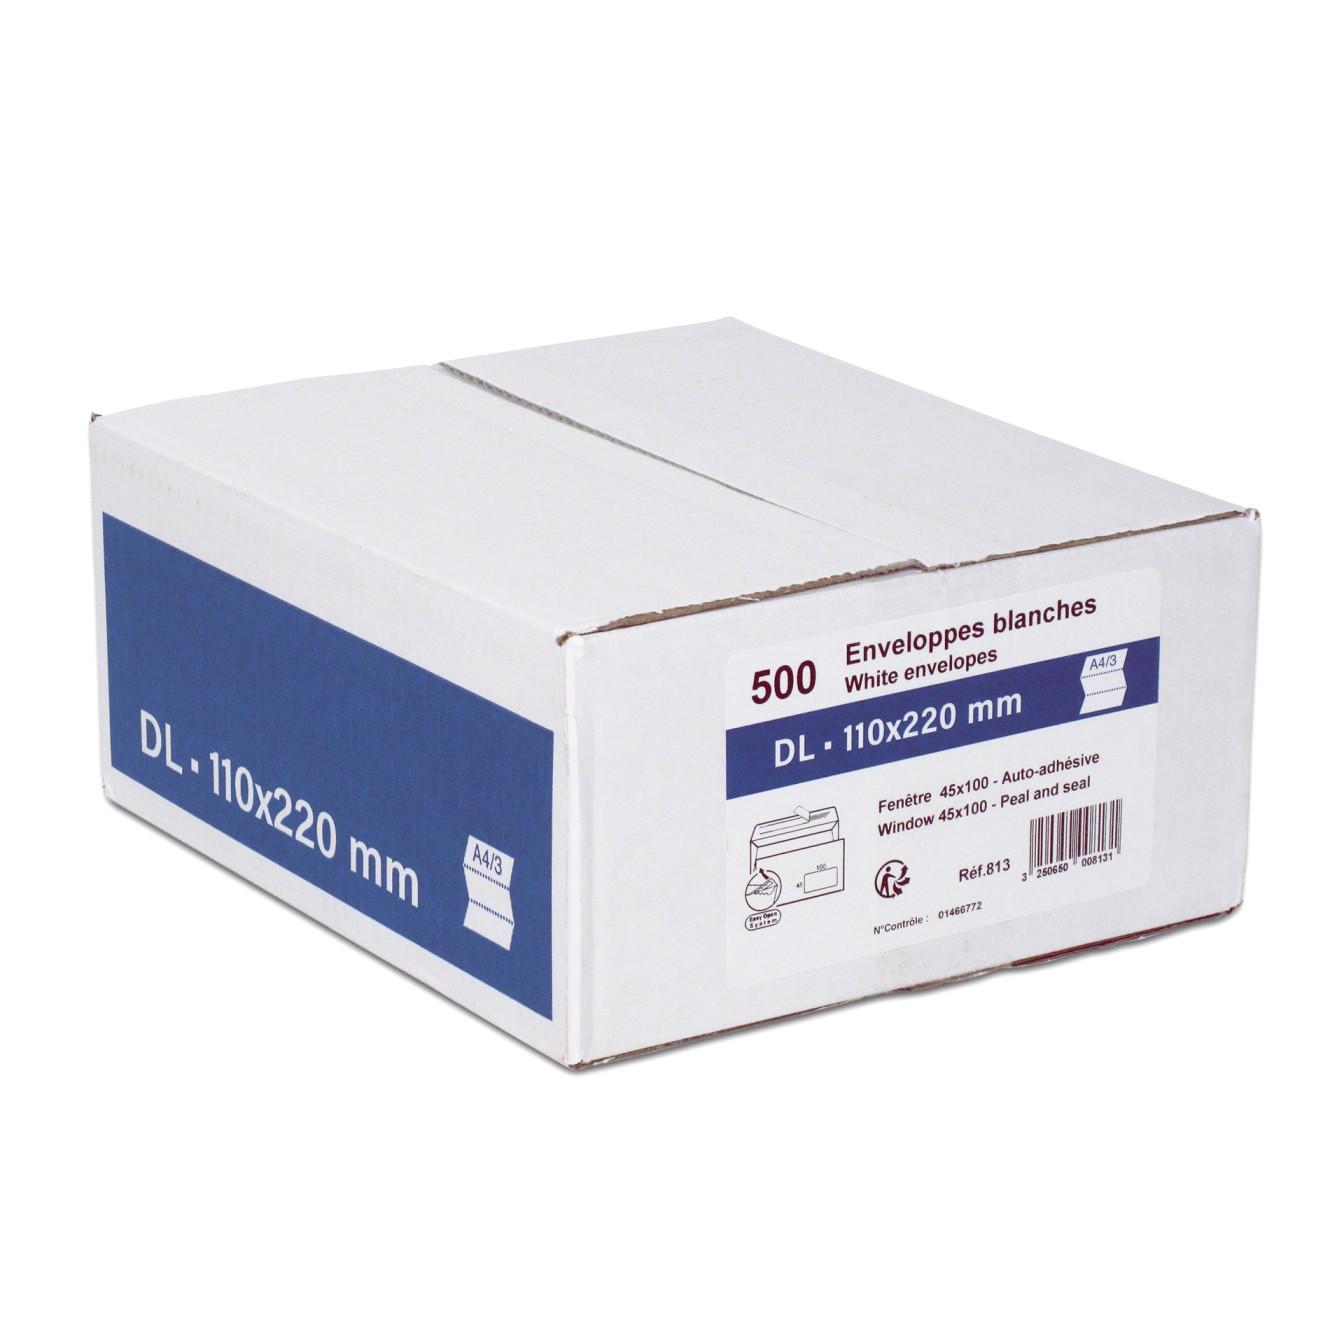 GPV - 500 Enveloppes DL 110 x 220 mm - 80 gr - fenêtre 45x100 mm - blanc - bande adhésive